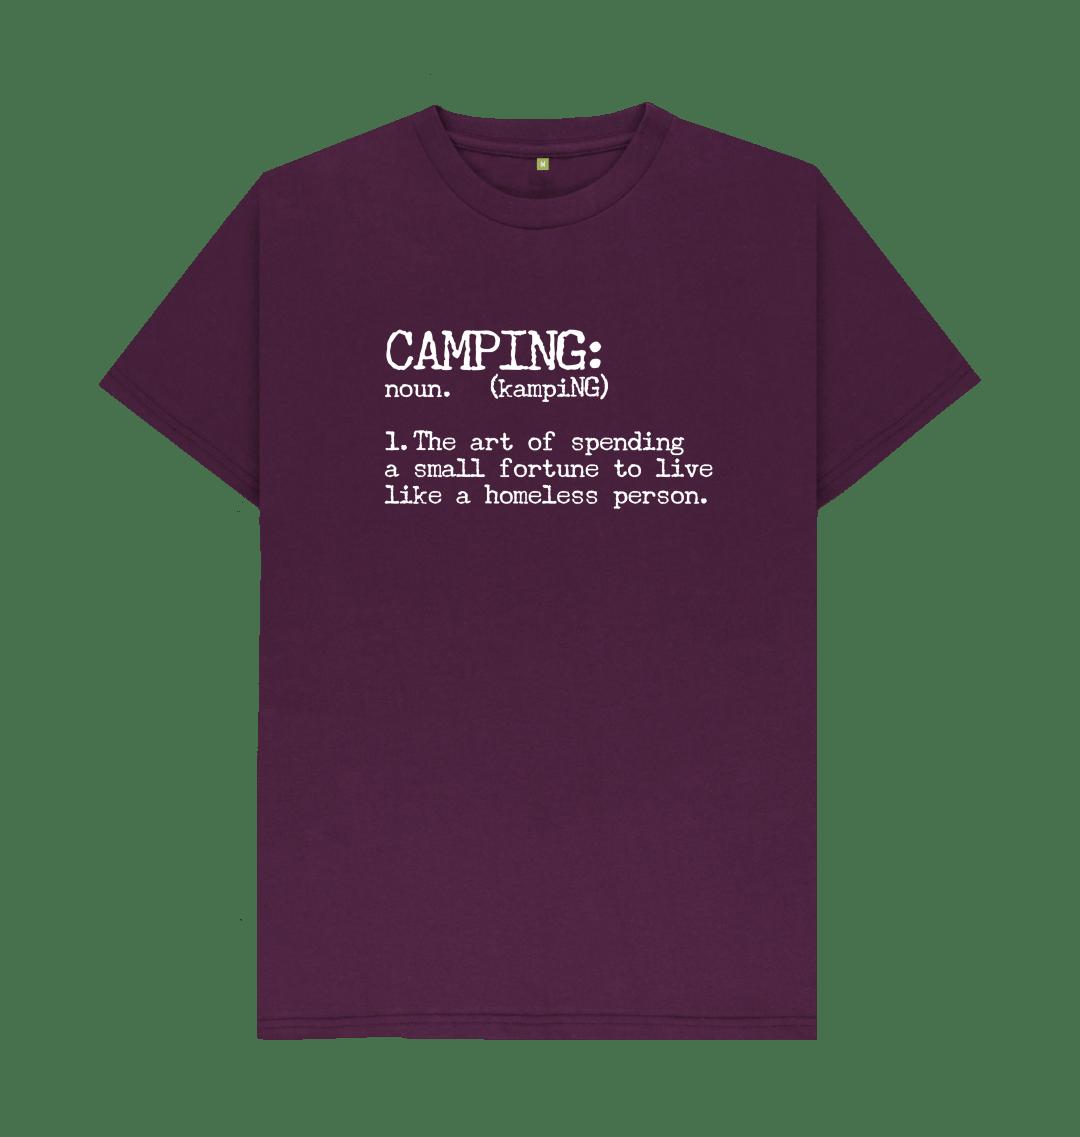 Camping Definition Funny Mens T Shirt Top - Organic Cotton, Vegan purple